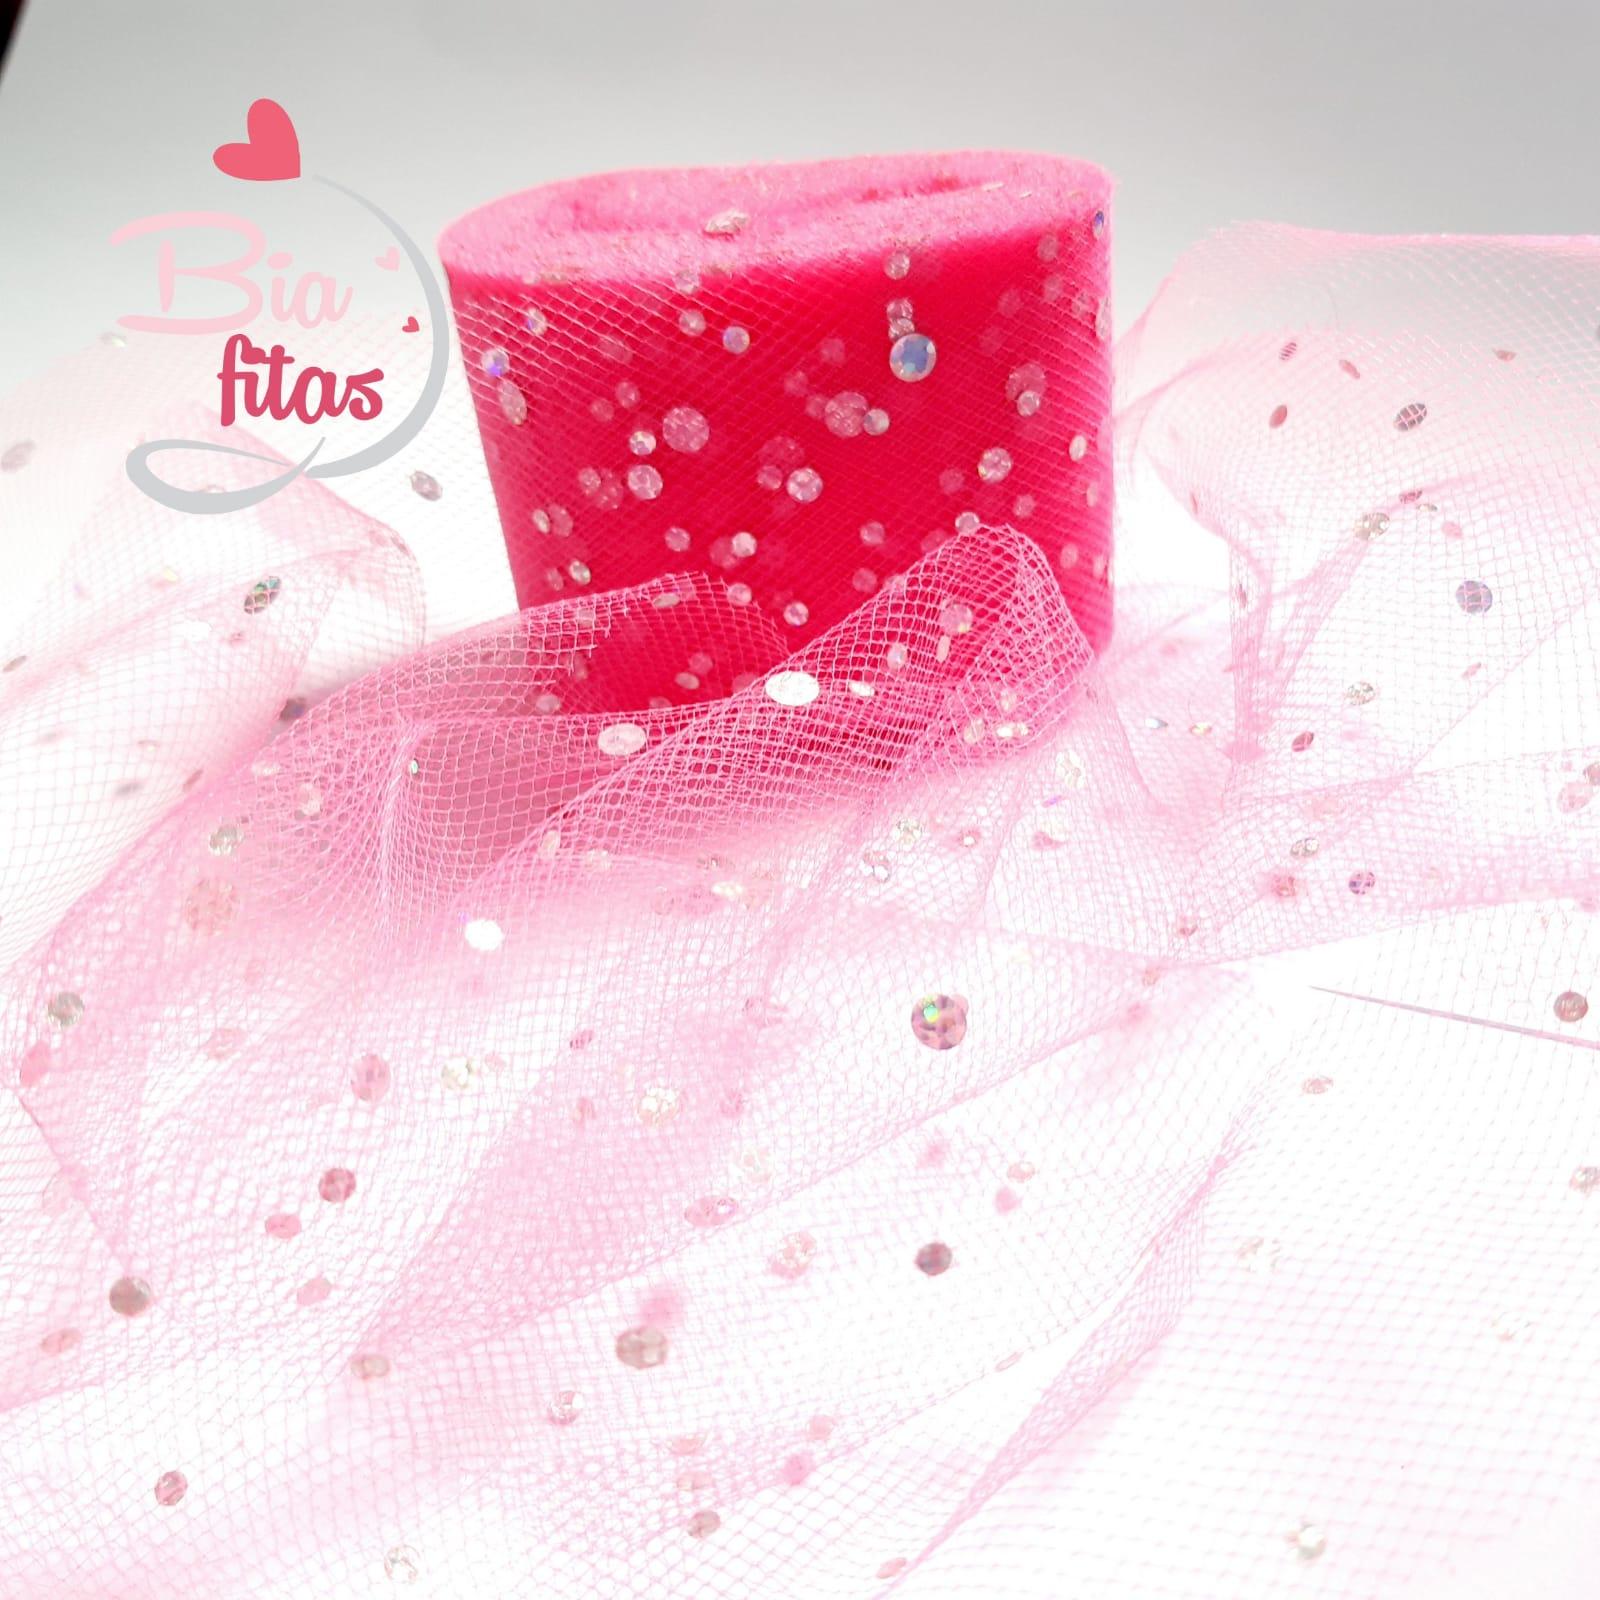 Fita de Tule Rosa Pink com brilho 50- 5metros